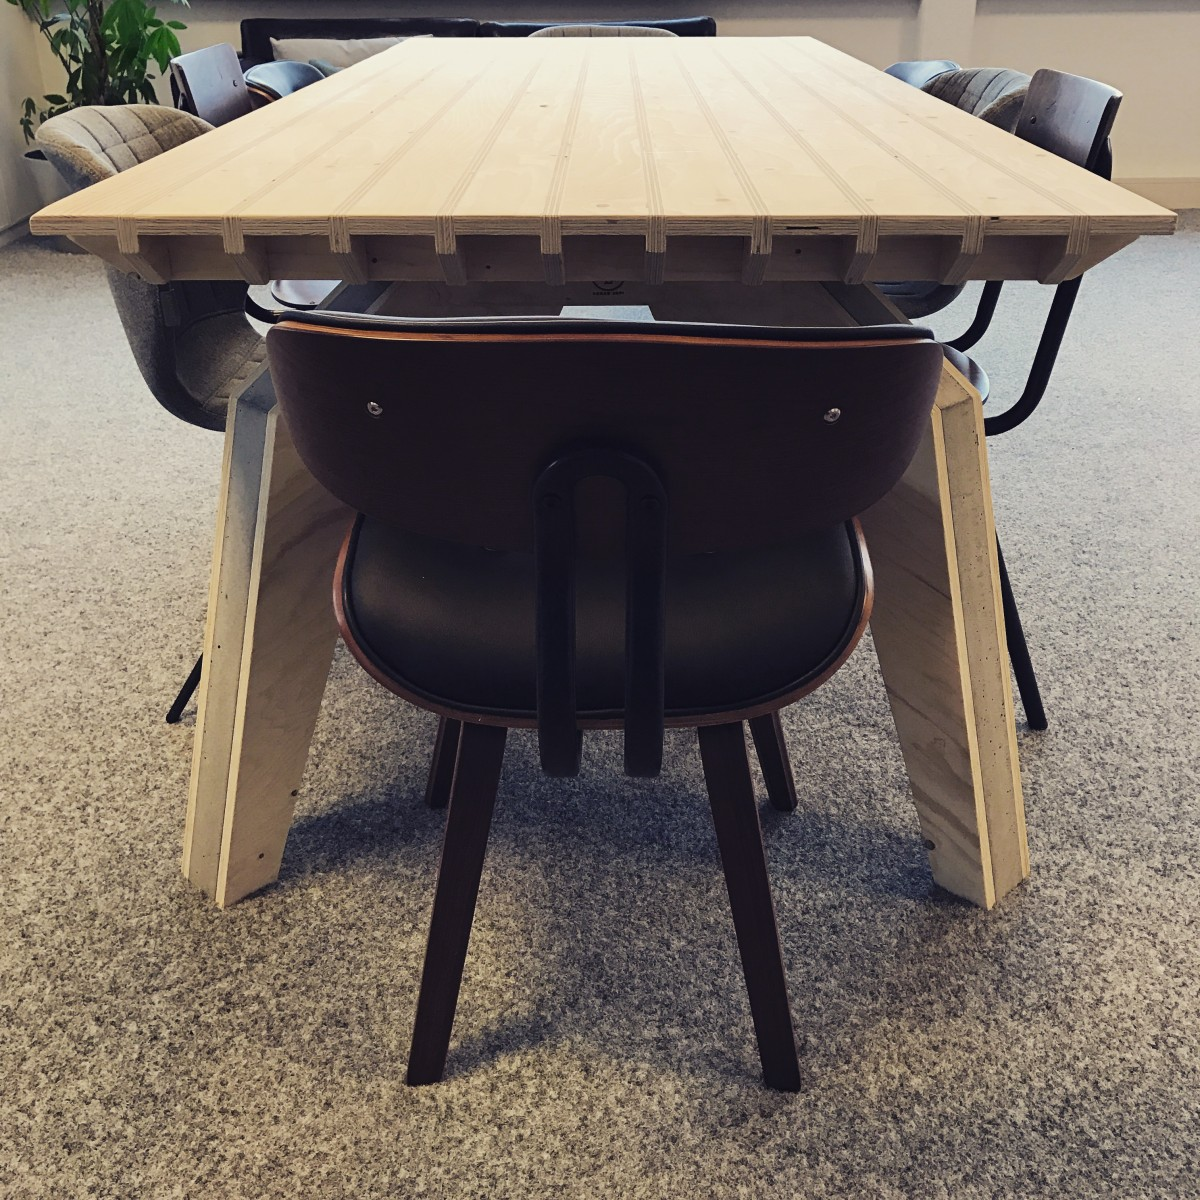 plywood multiplex kantine kantoor vergaderen tafel maatwerk office apps app custom uniek